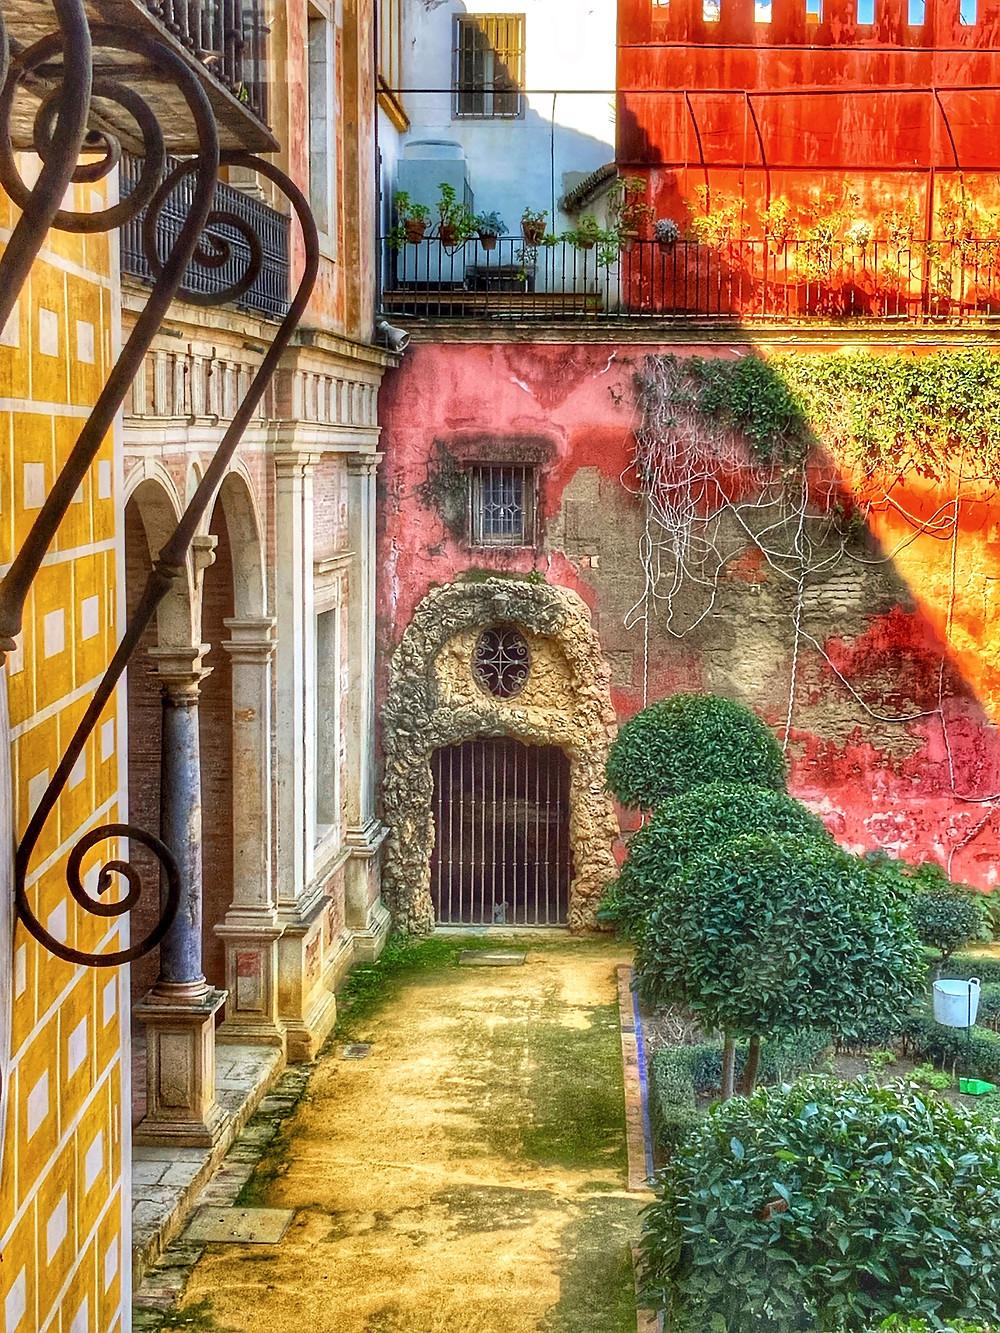 the Venus Grotto in the gardens of the Casa de Pilatos